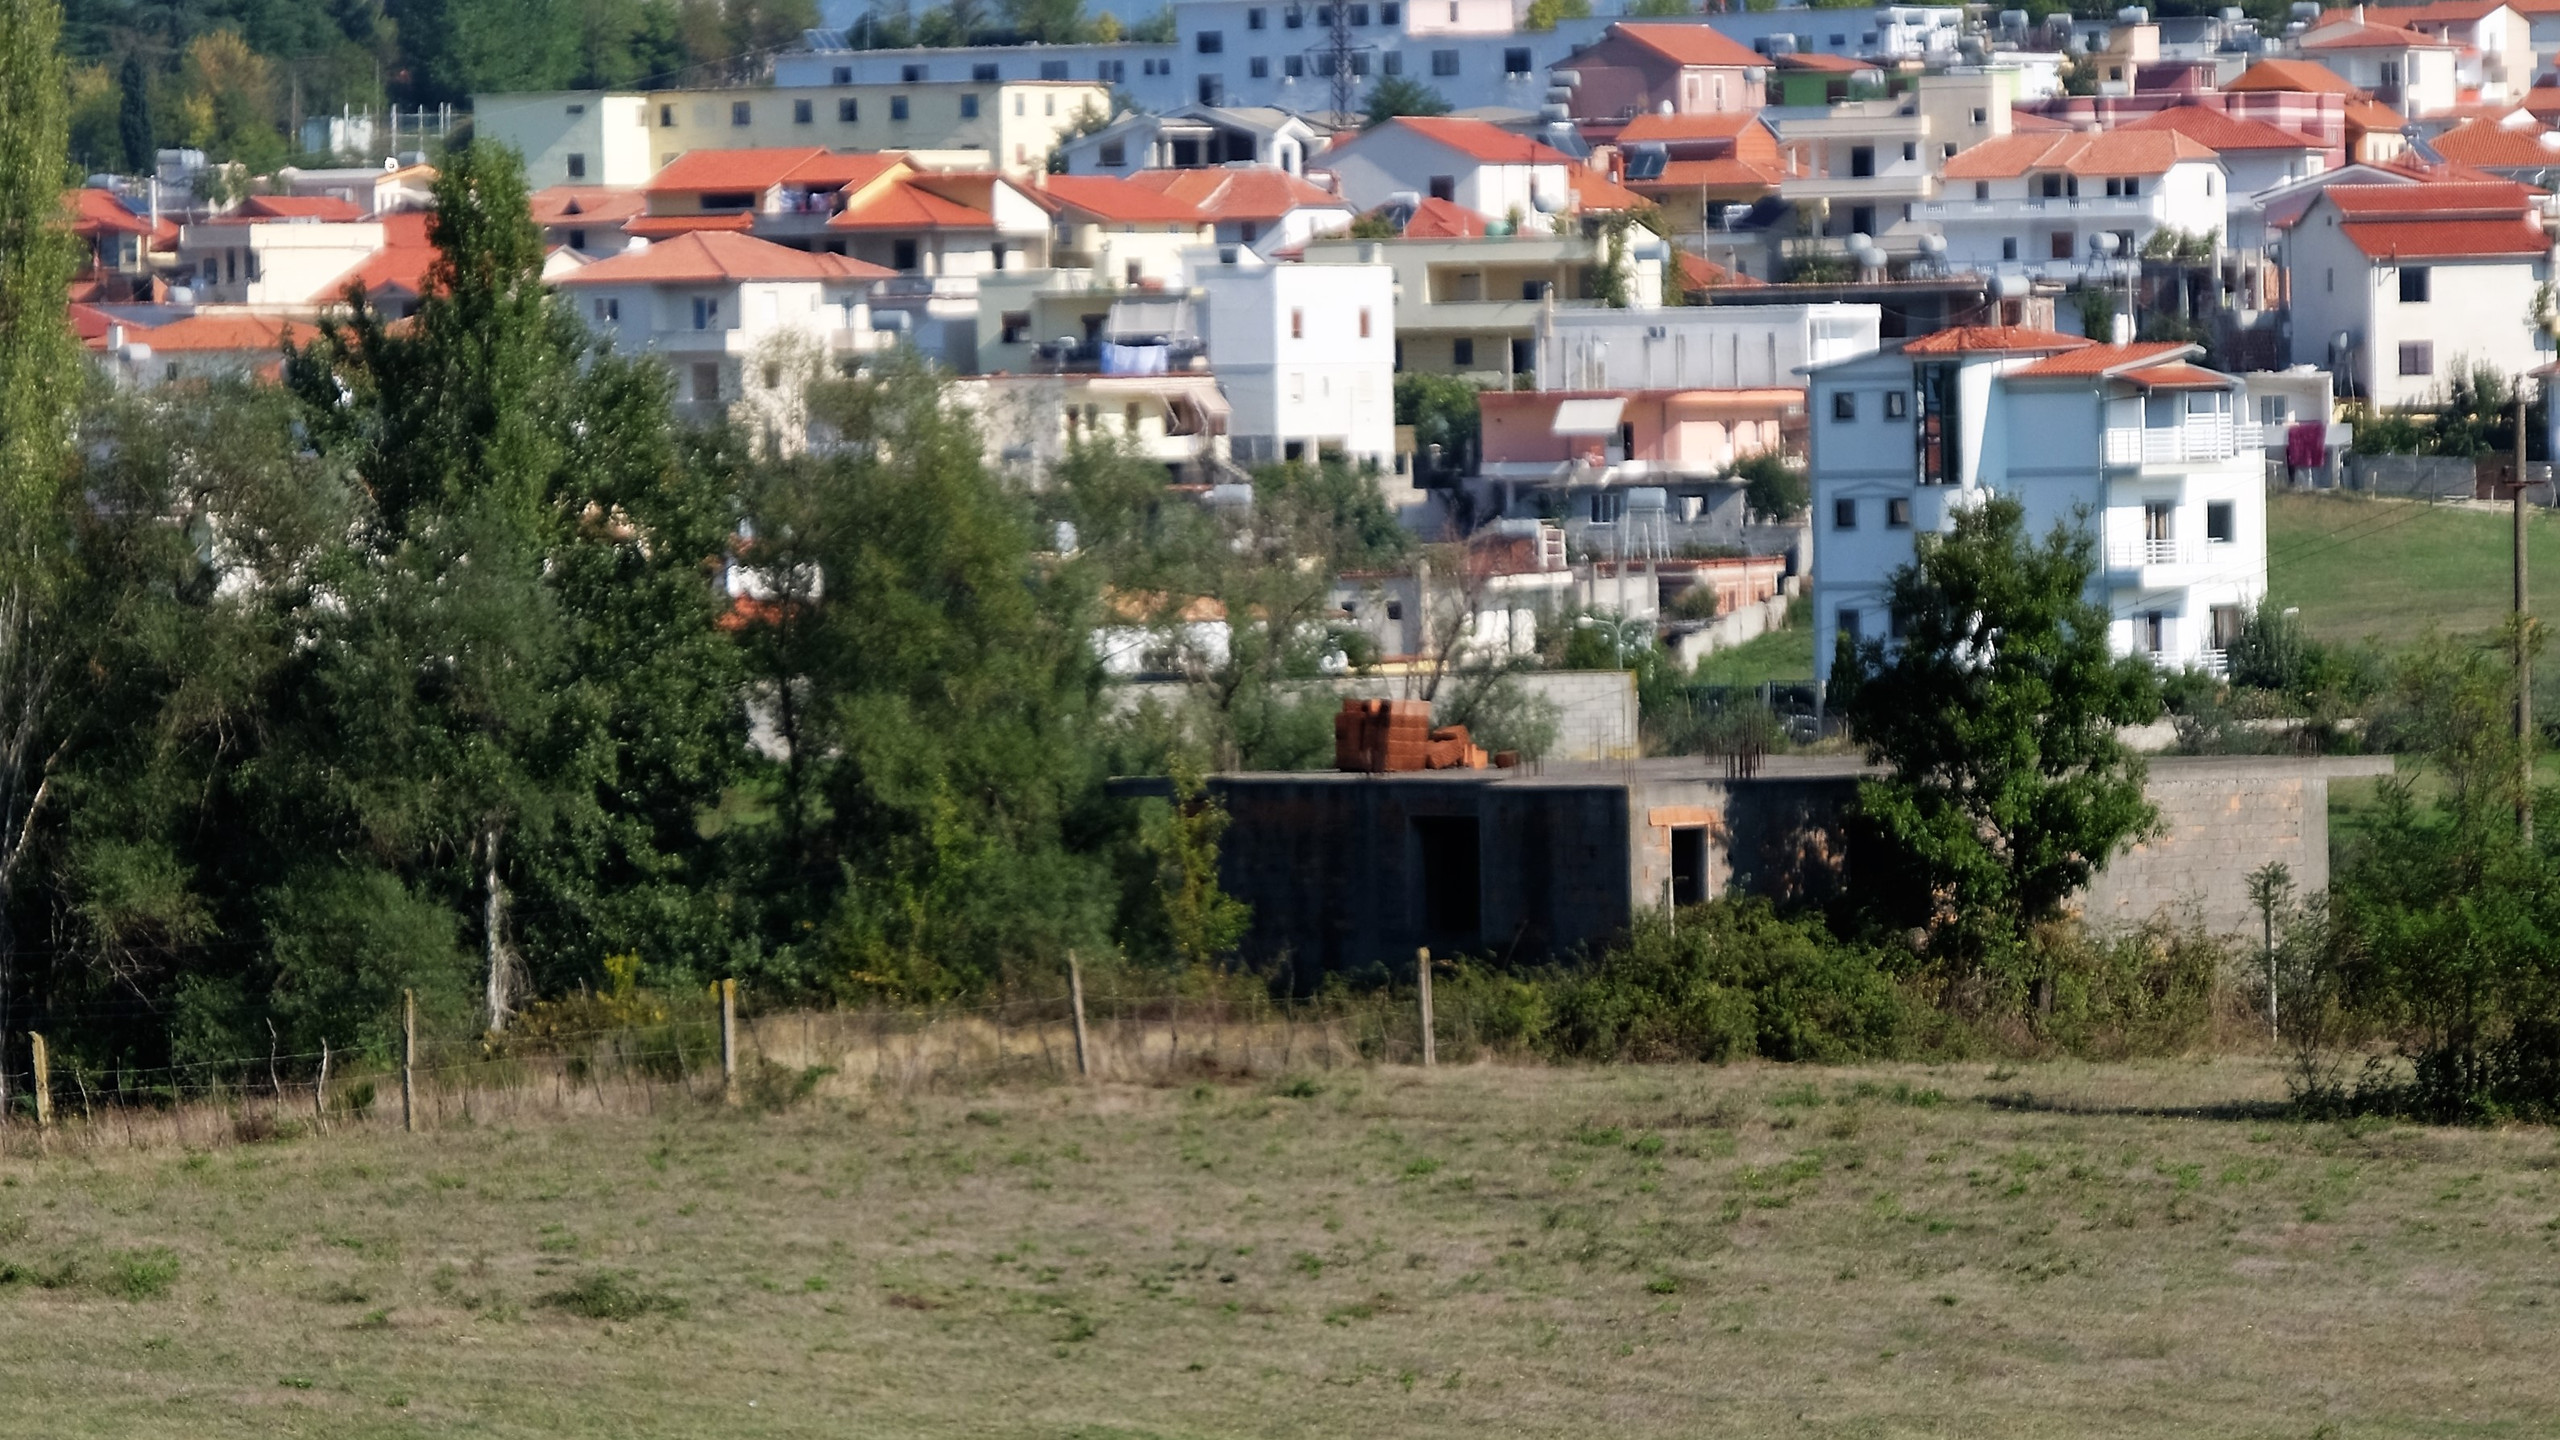 Berger à la périphérie de Tirana